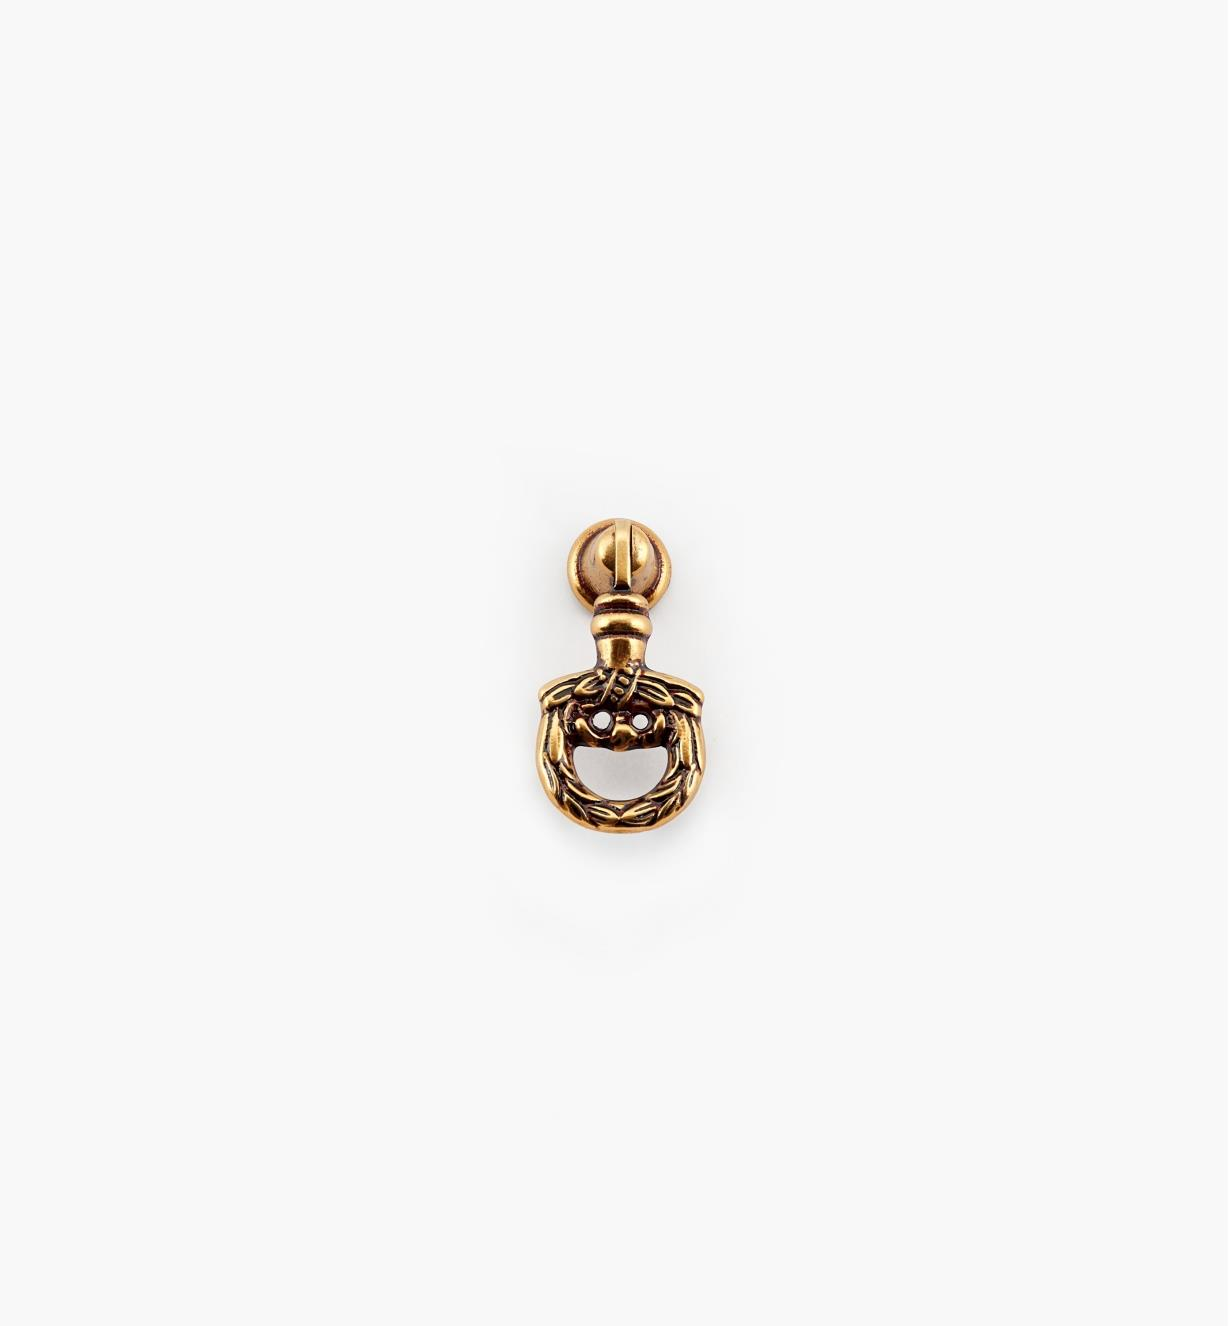 01A5872 - Poignée pendante de 50mm, quincaillerie Louis XVI, série II